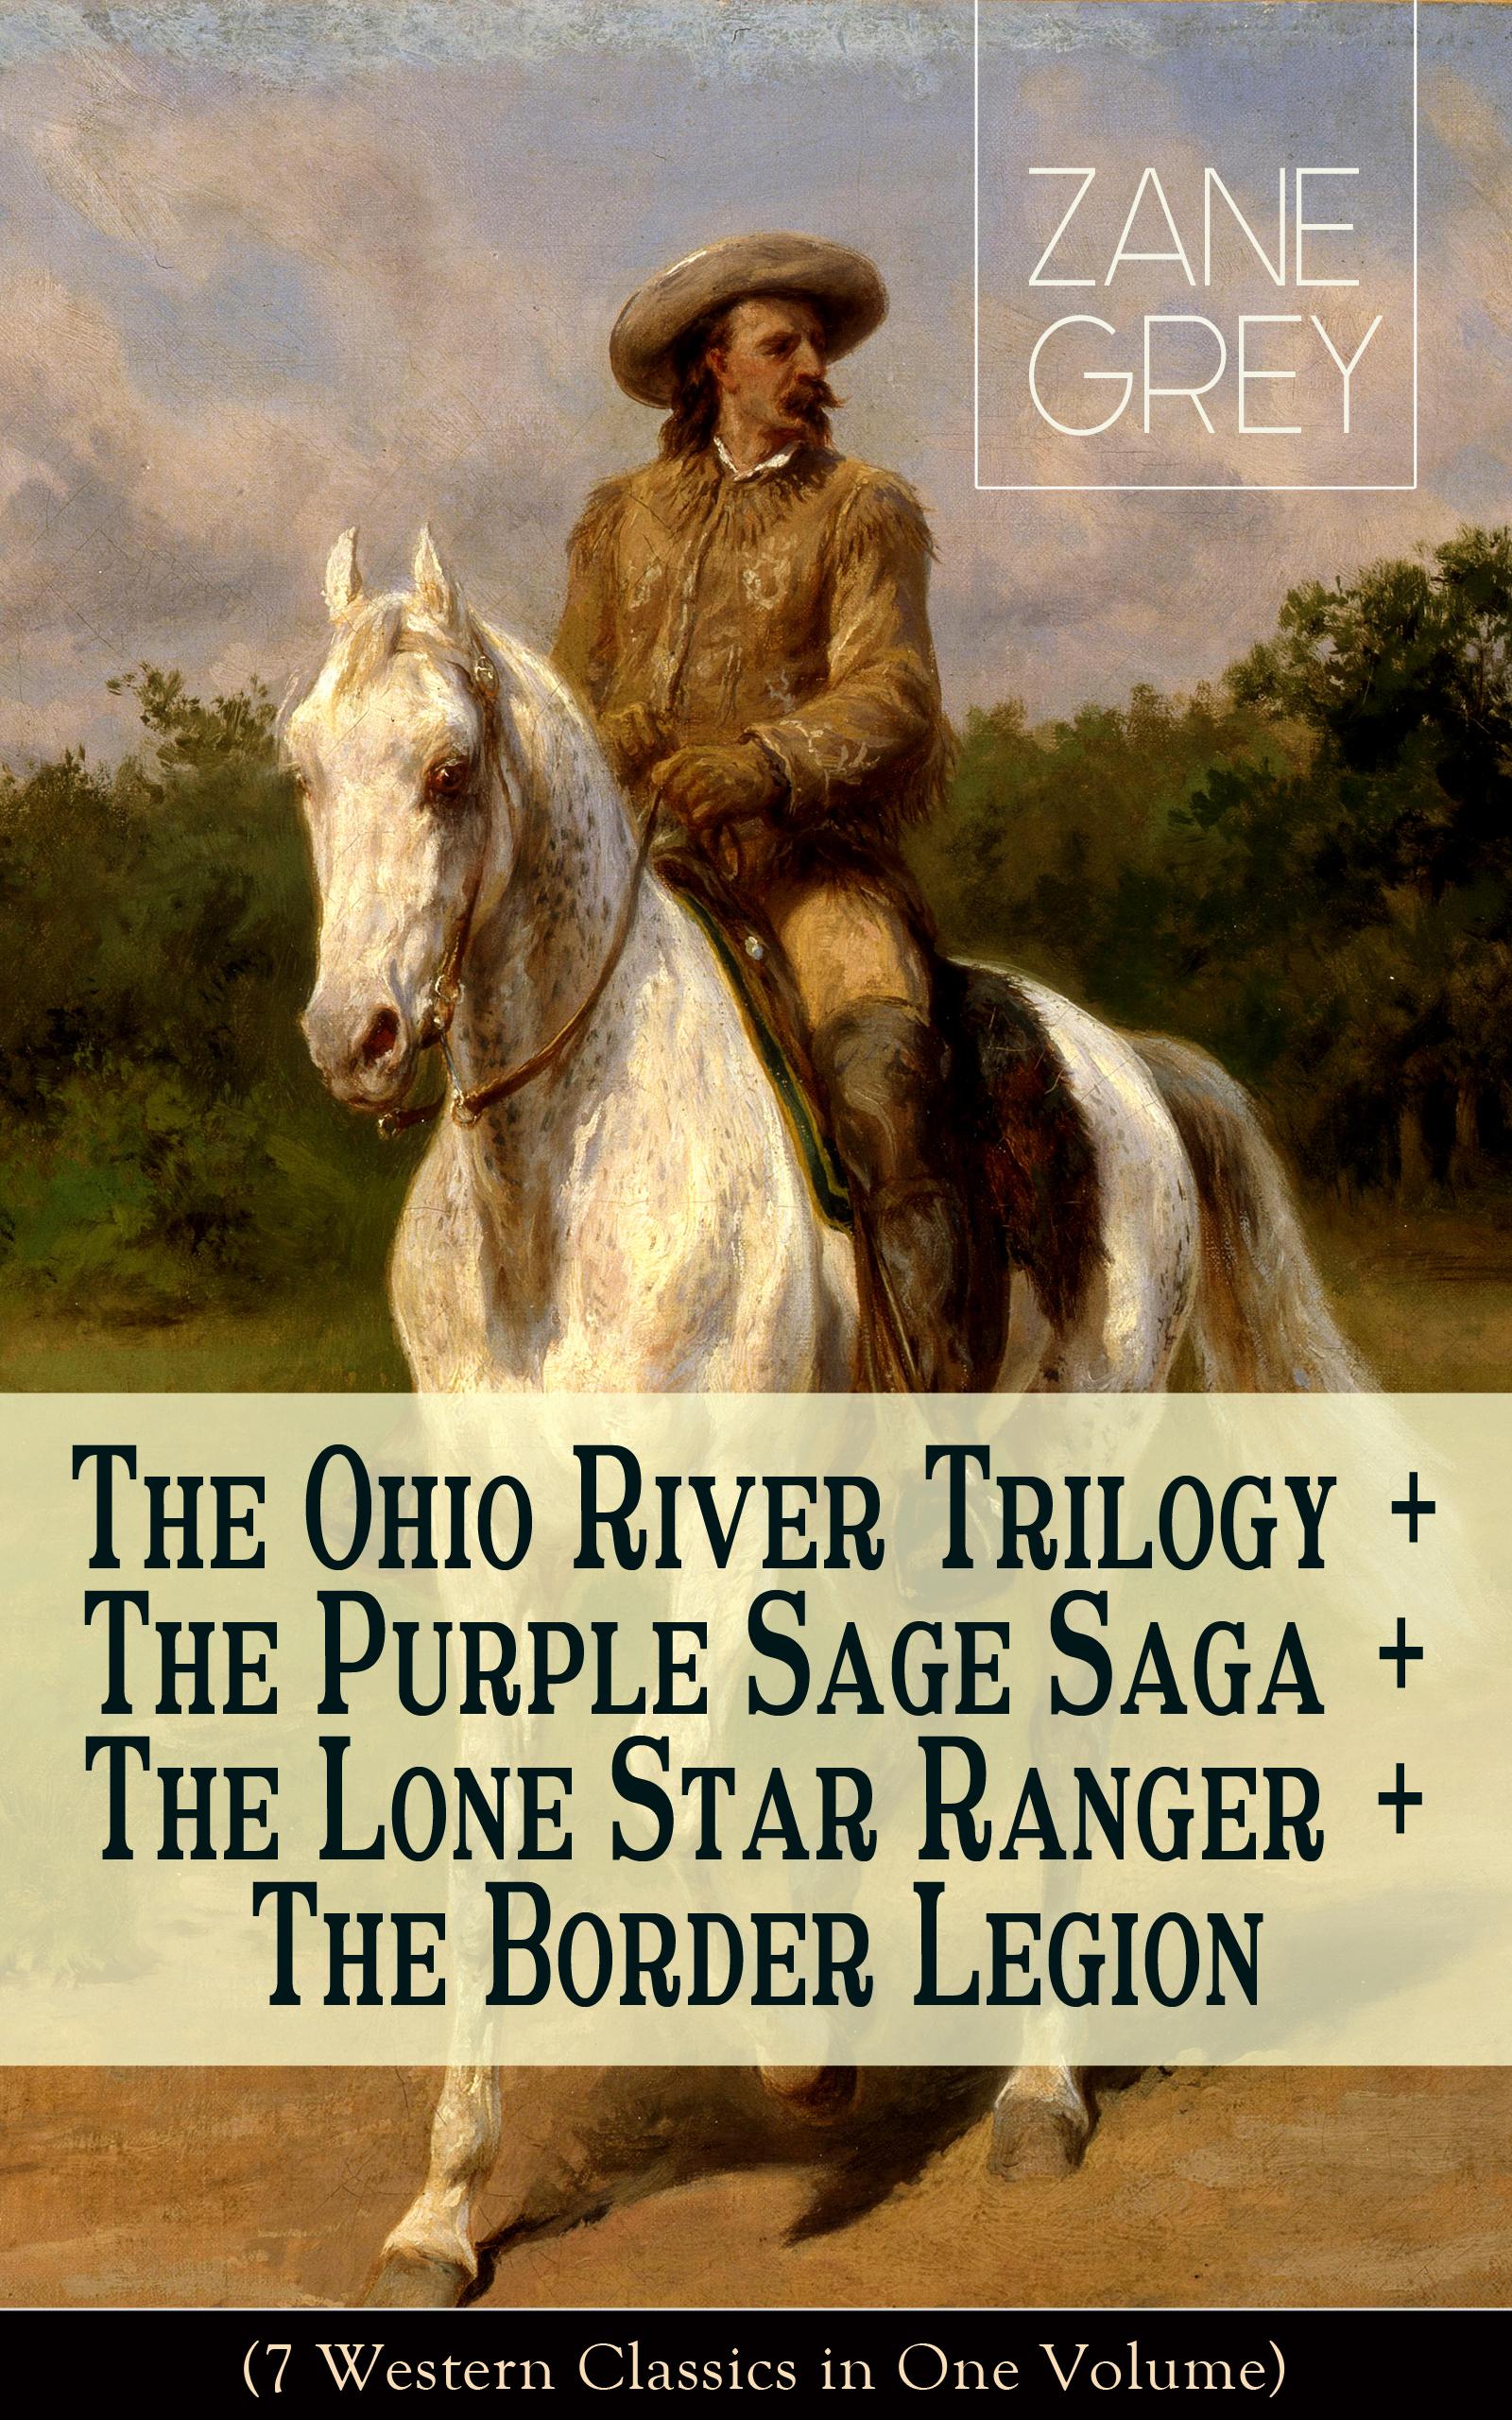 Zane Grey The Ohio River Trilogy + The Purple Sage Saga + The Lone Star Ranger + The Border Legion (7 Western Classics in One Volume) цена 2017